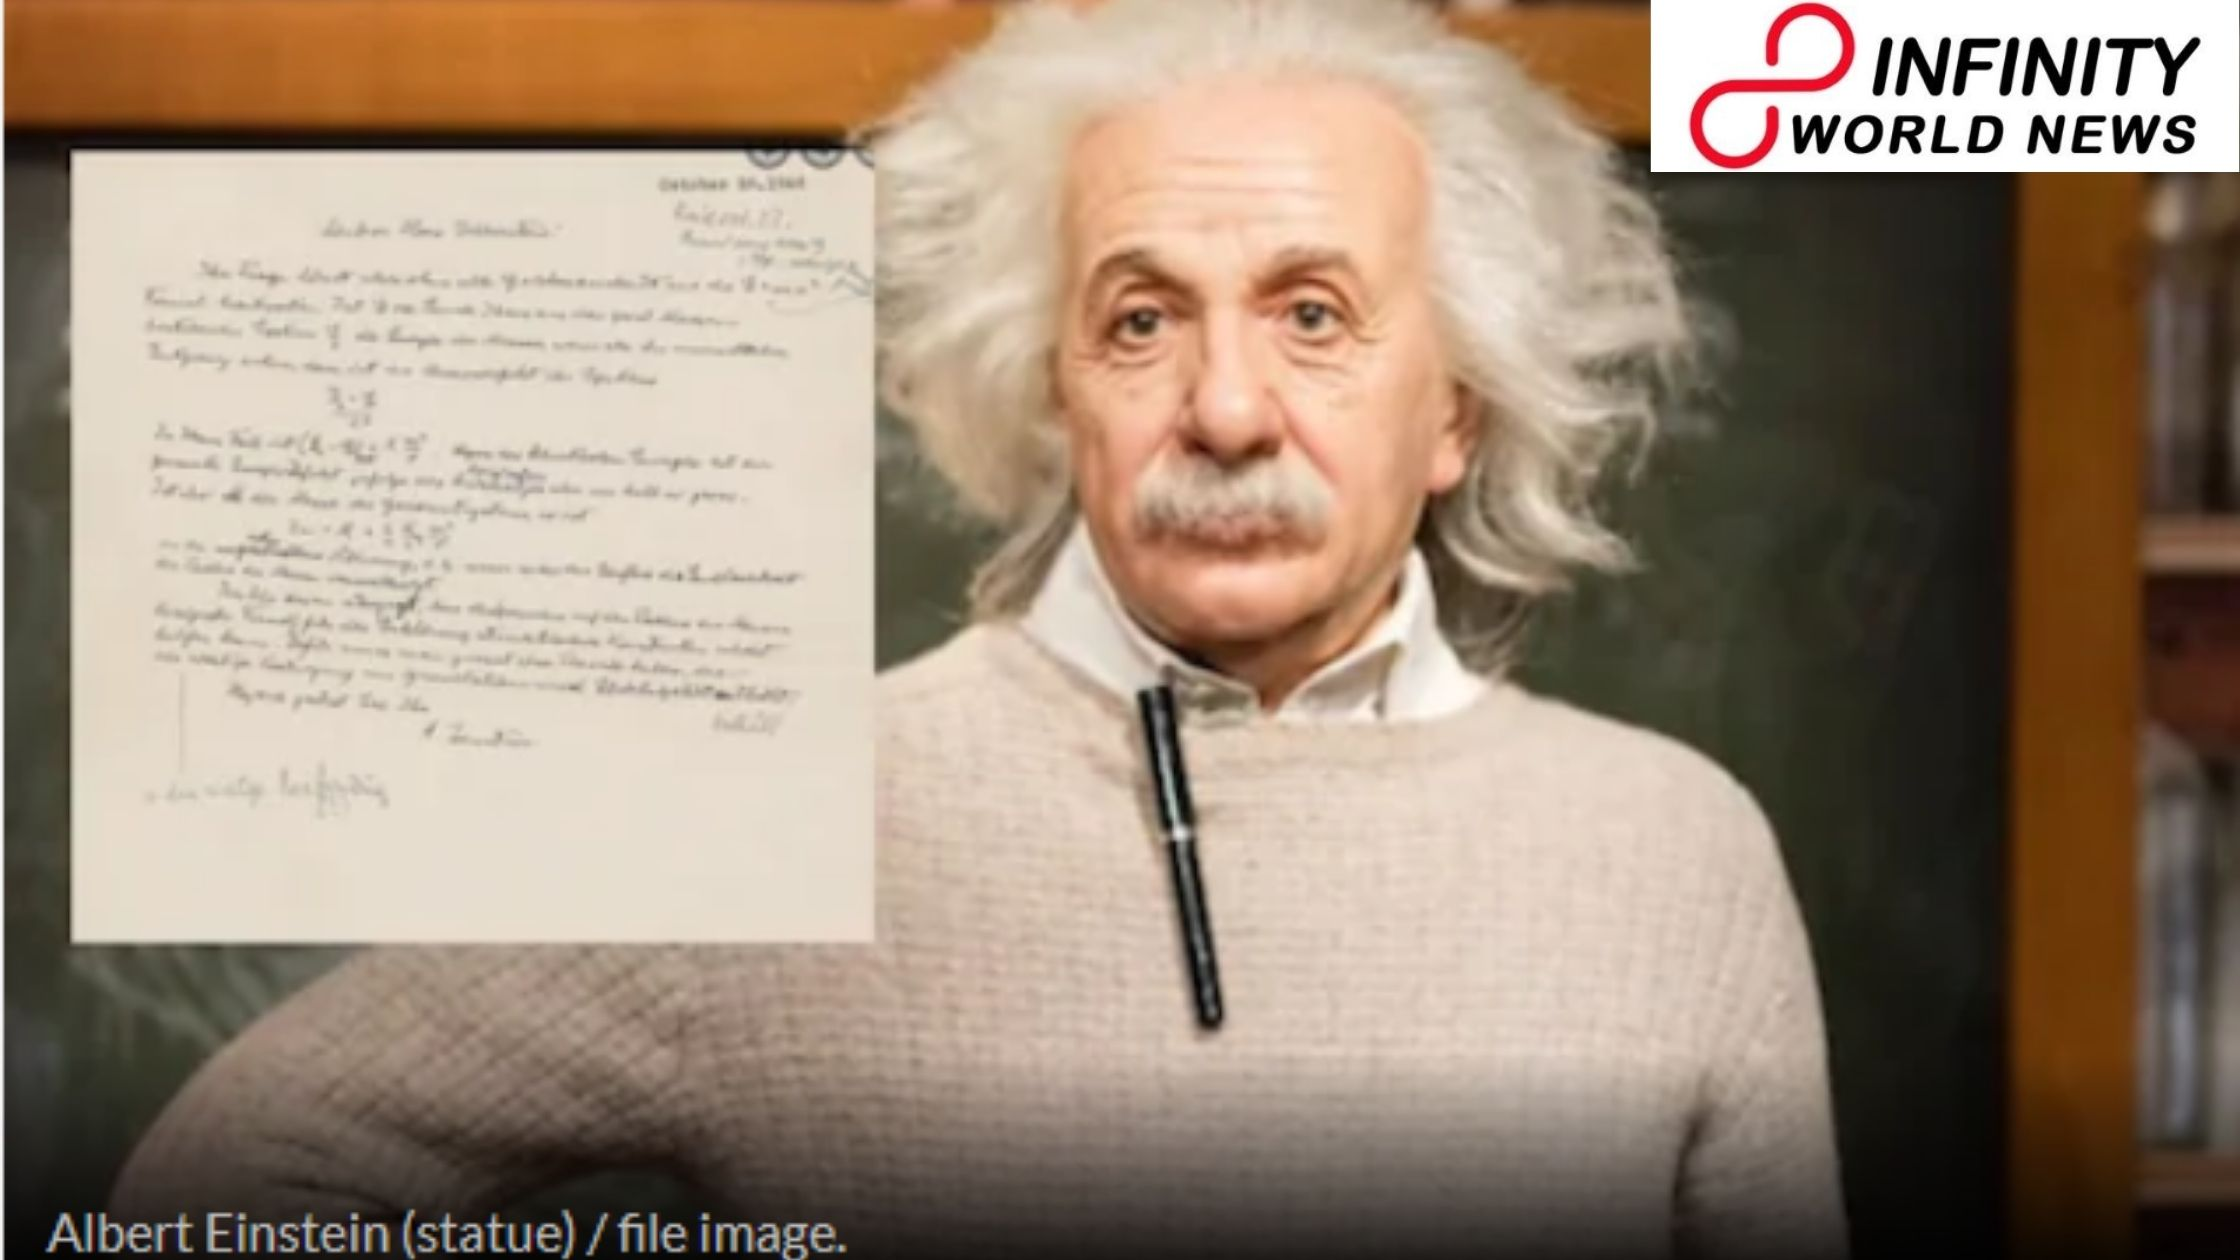 Albert Einstein s Handwritten Letter Equation available for 3 Crore